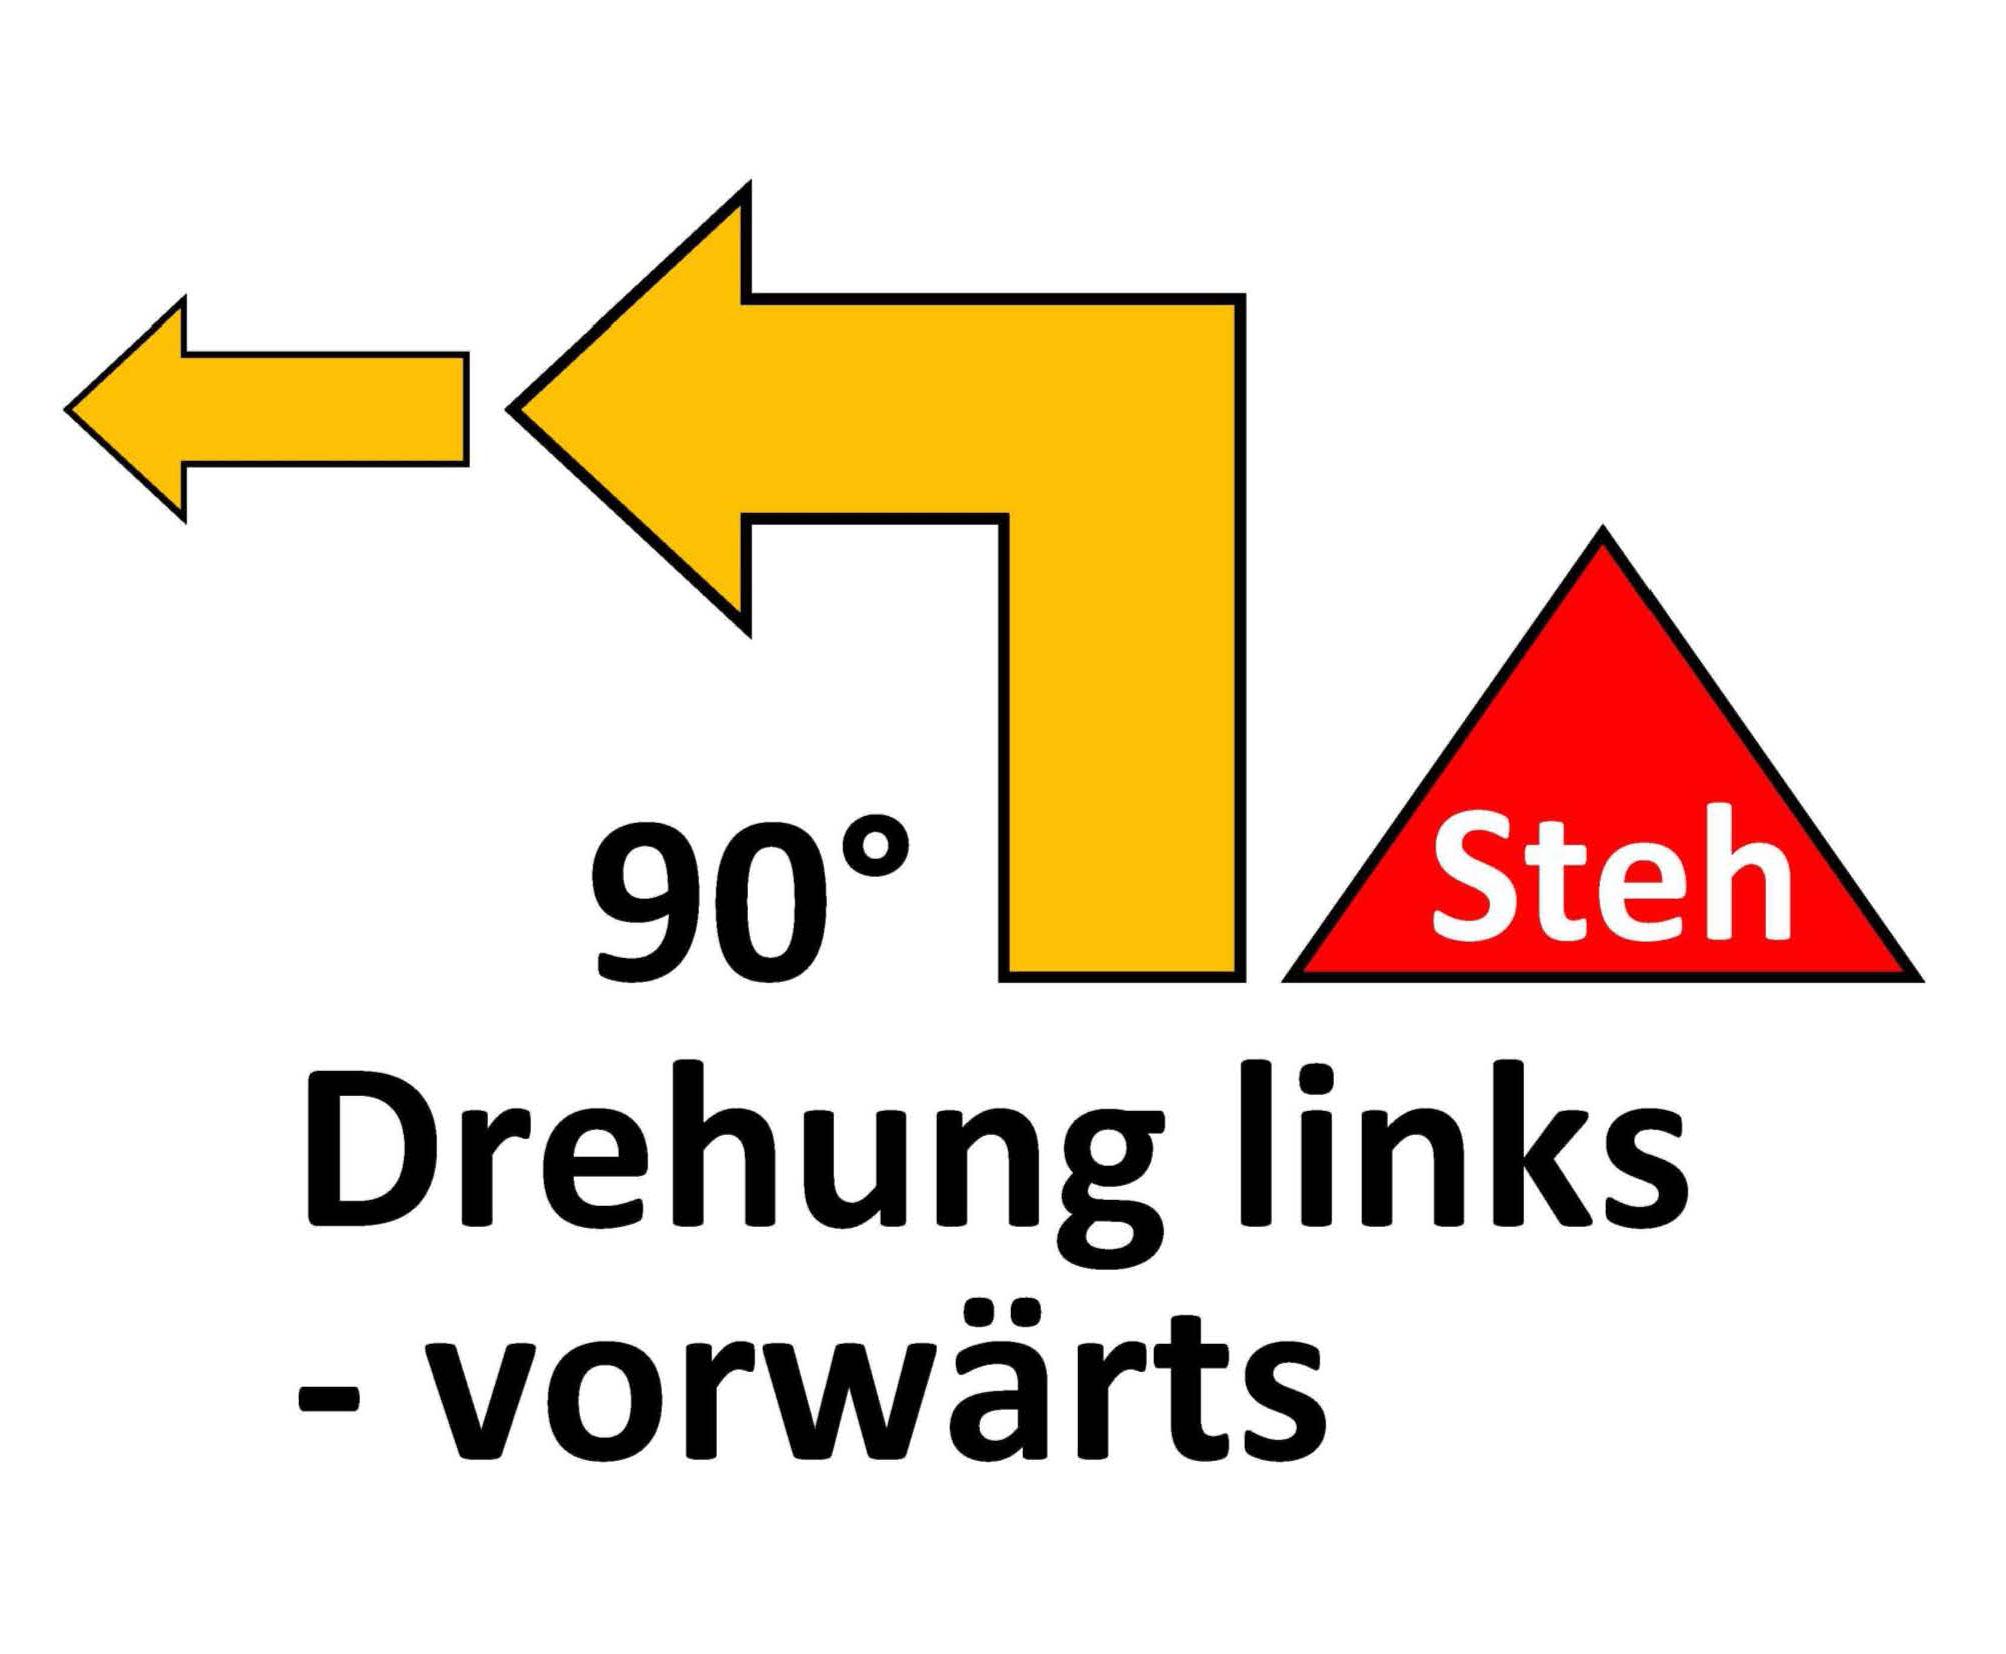 RO_Regelwerk_VDH_3.0_Stand_01-2017 - 120